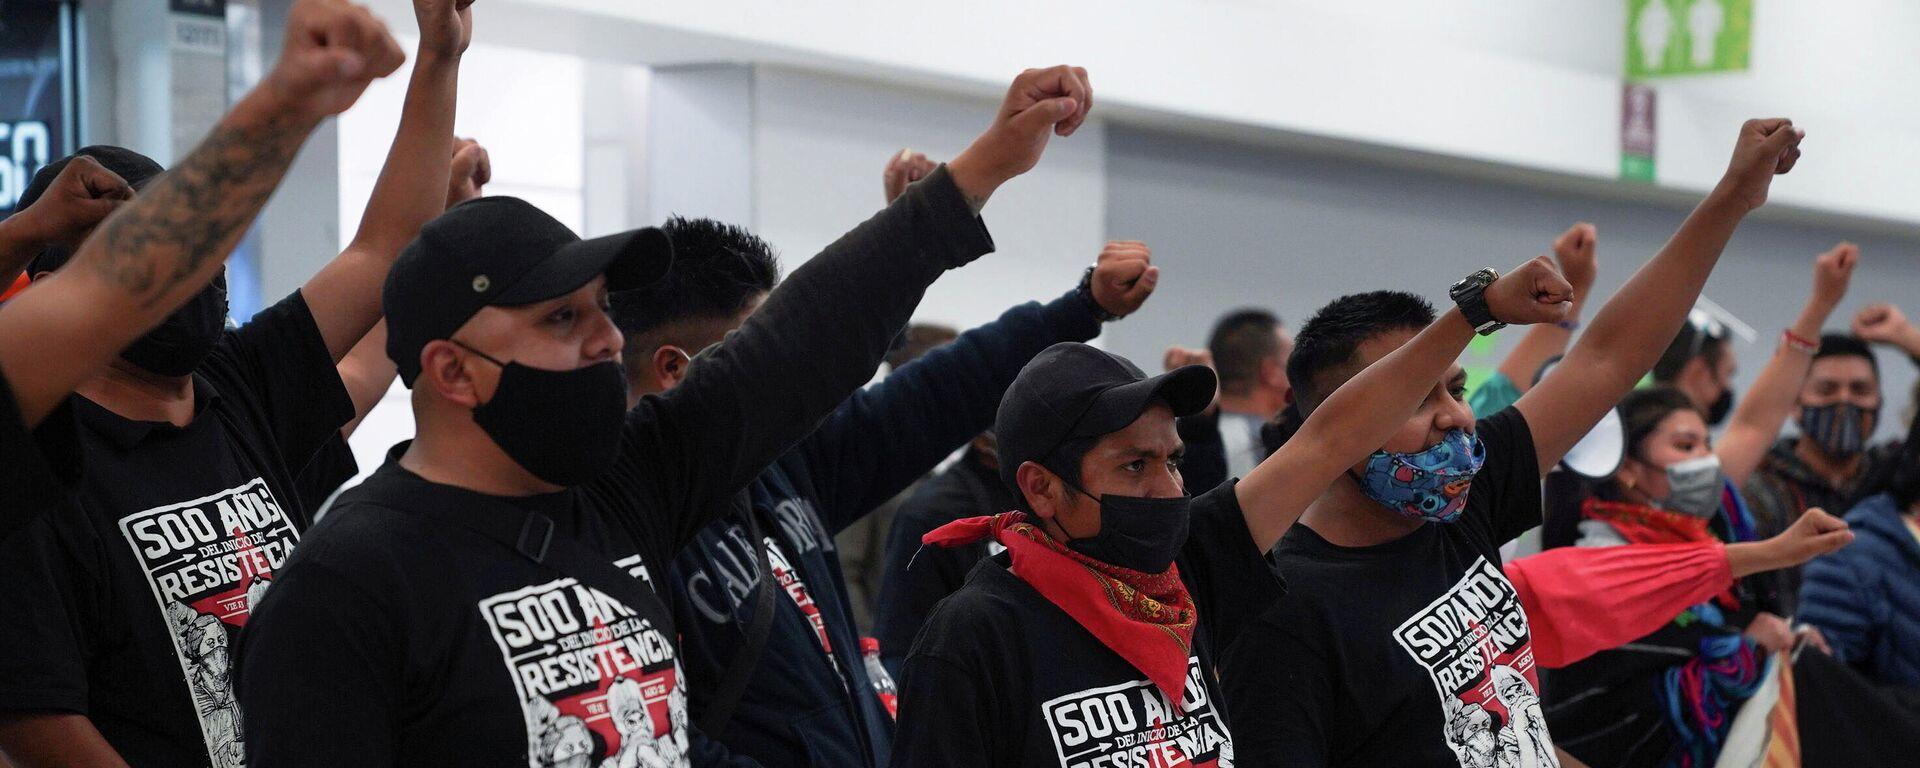 Integrantes del EZLN reciben a gira europea - Sputnik Mundo, 1920, 20.09.2021